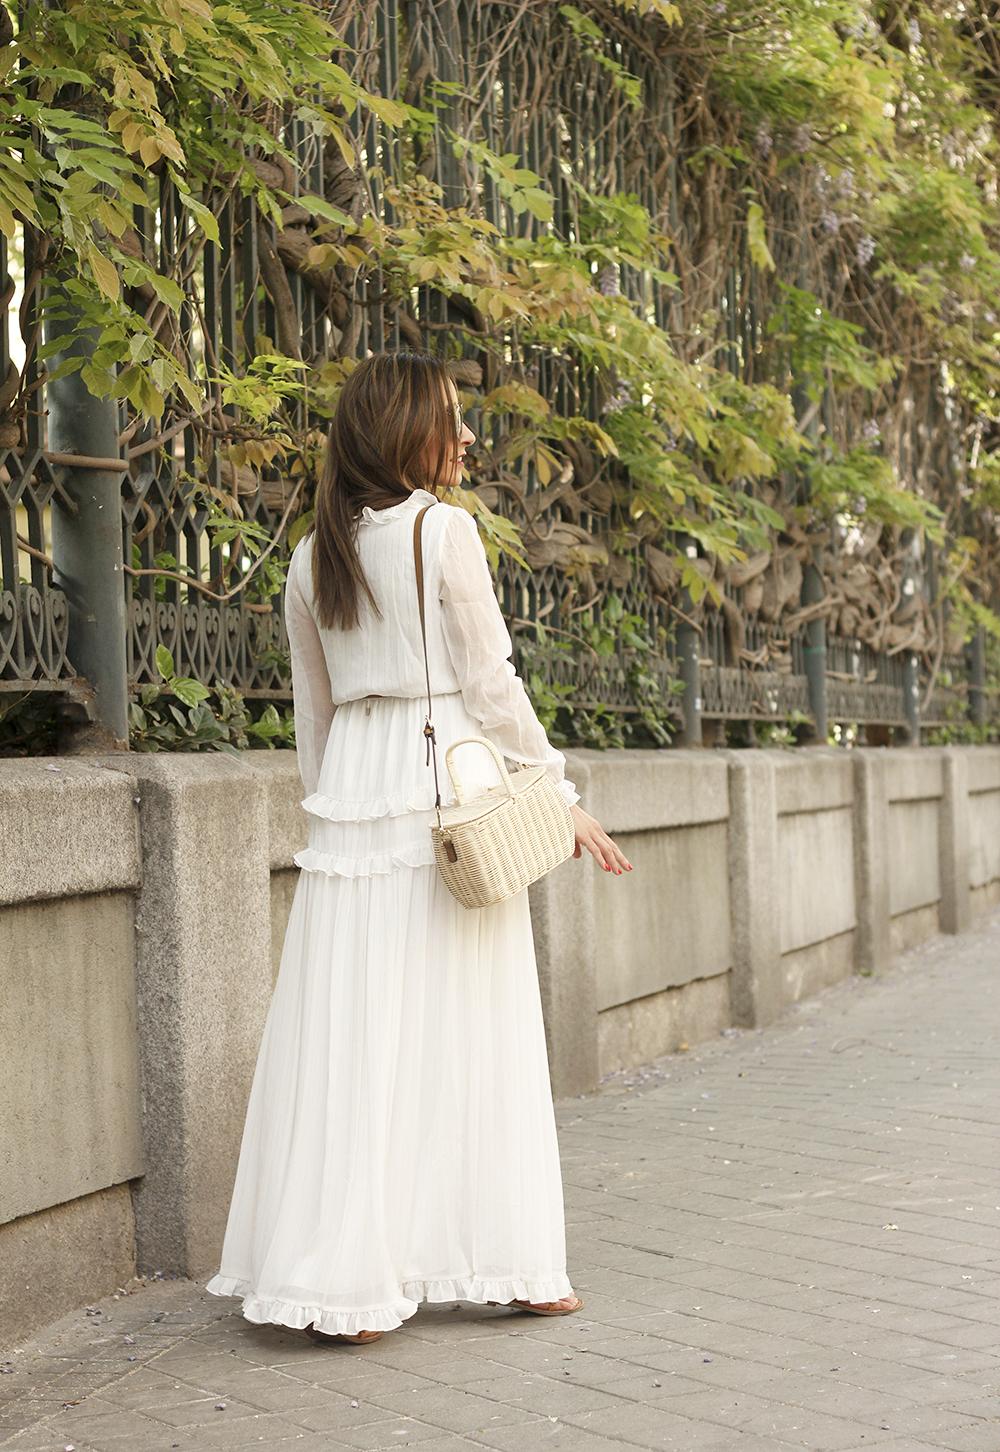 white maxi dress Subtle golden stripes wicker bag sandals céline sunnies spring outfit 02